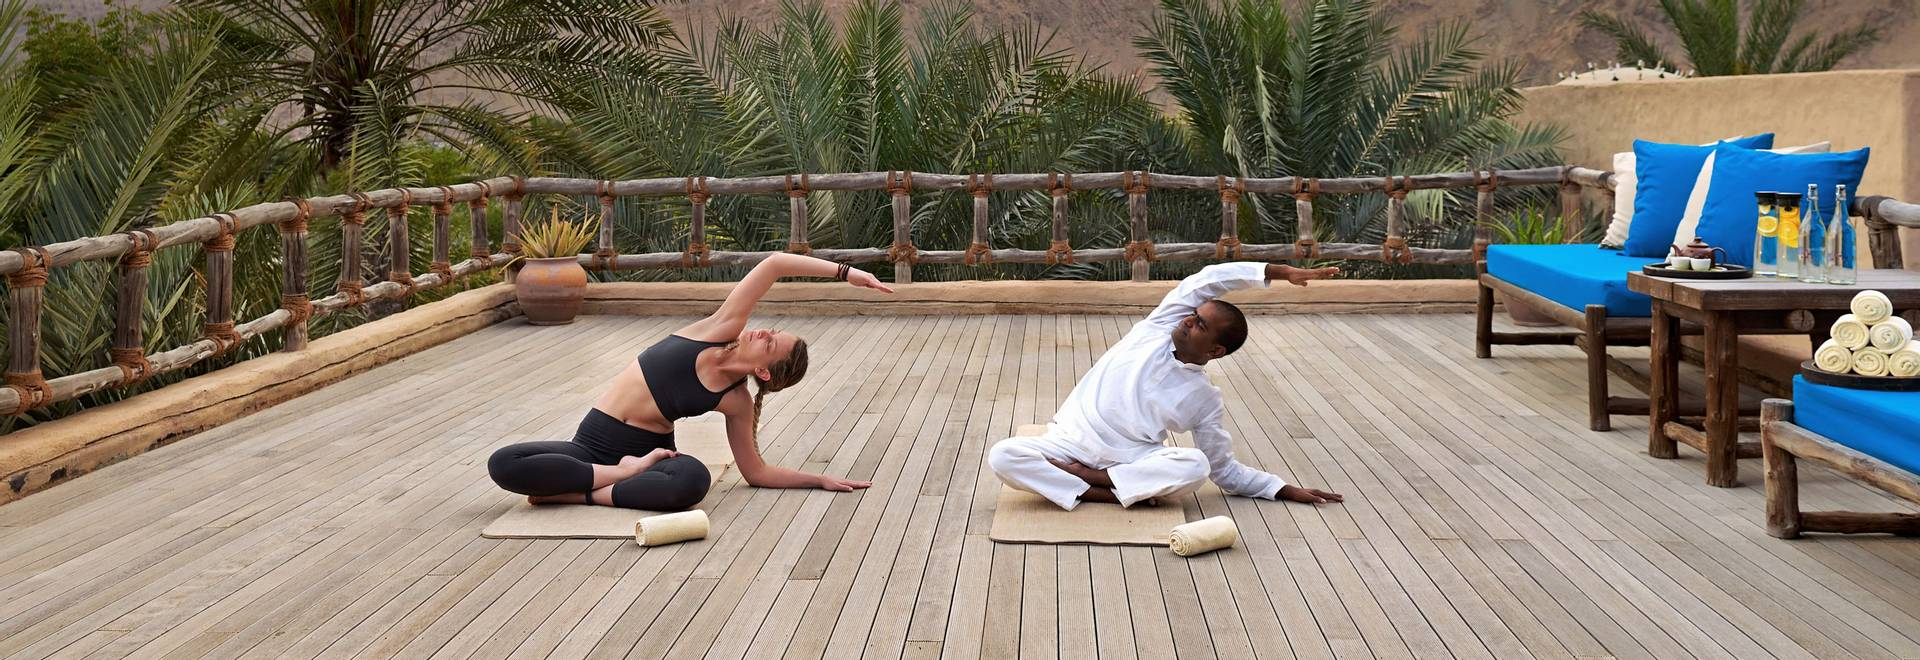 Yoga_at_spa4_[6970-A4].jpg